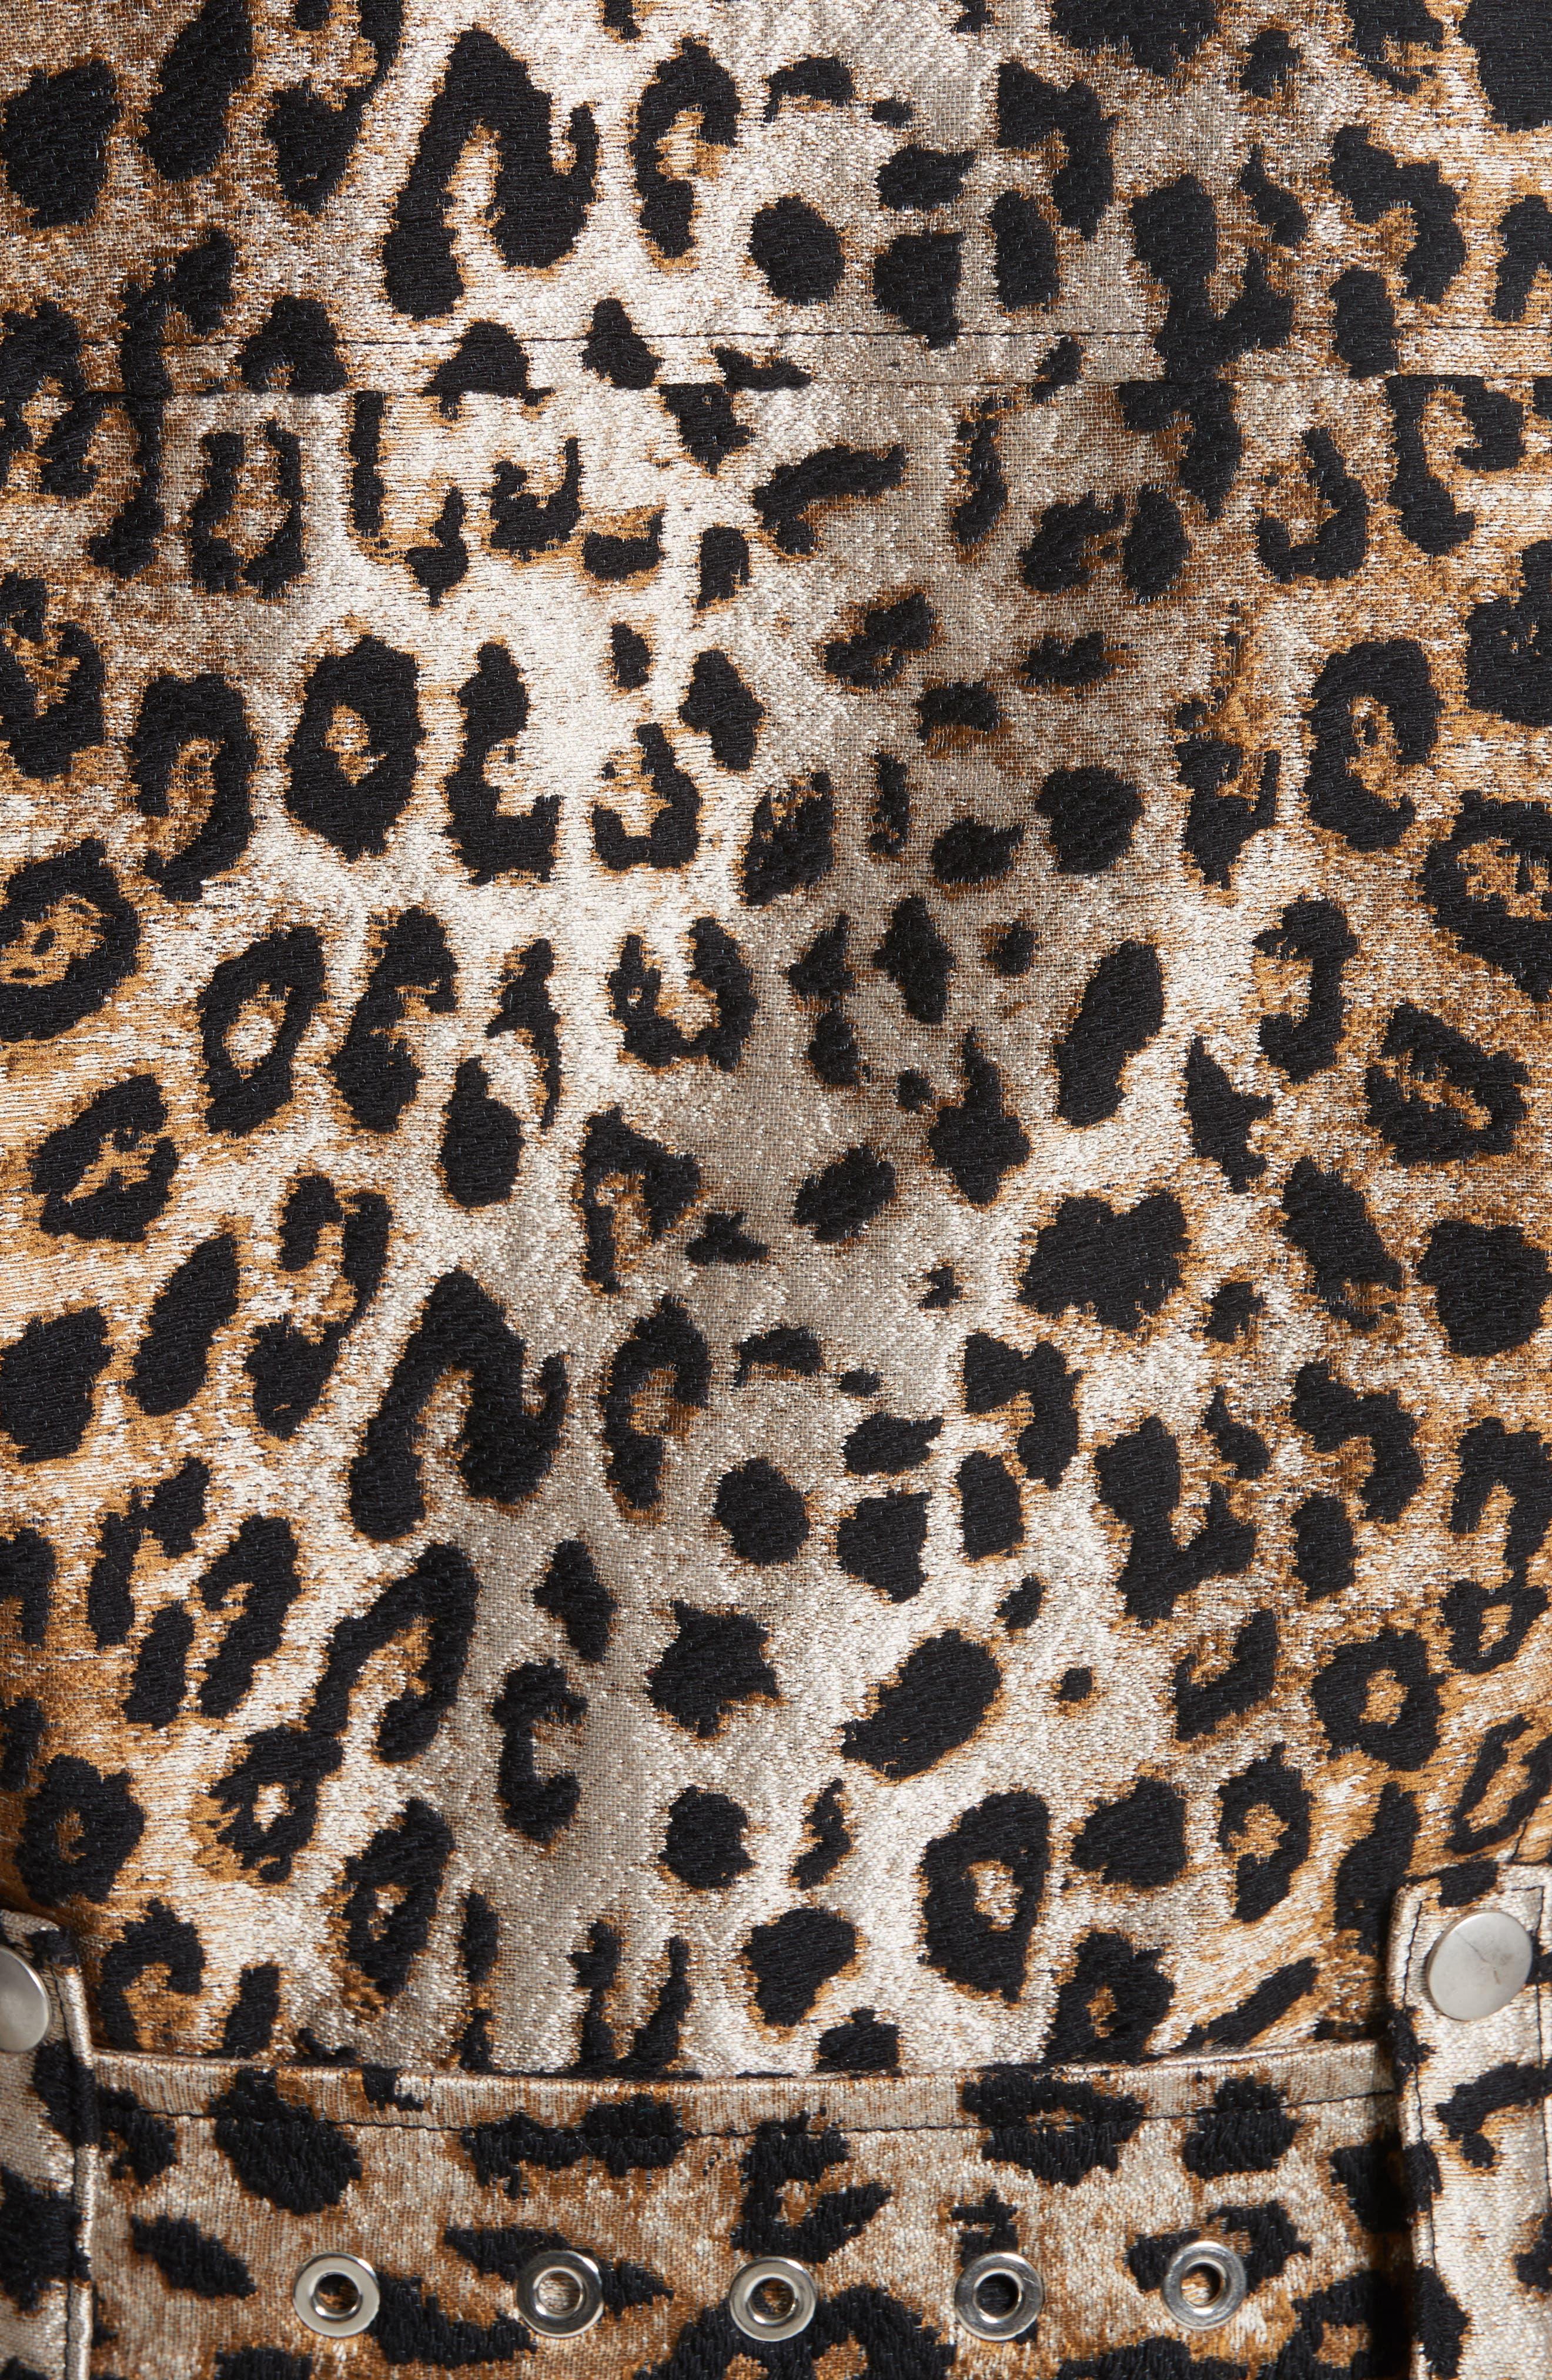 Leopard Jacquard Trench Coat,                             Alternate thumbnail 6, color,                             Leopard